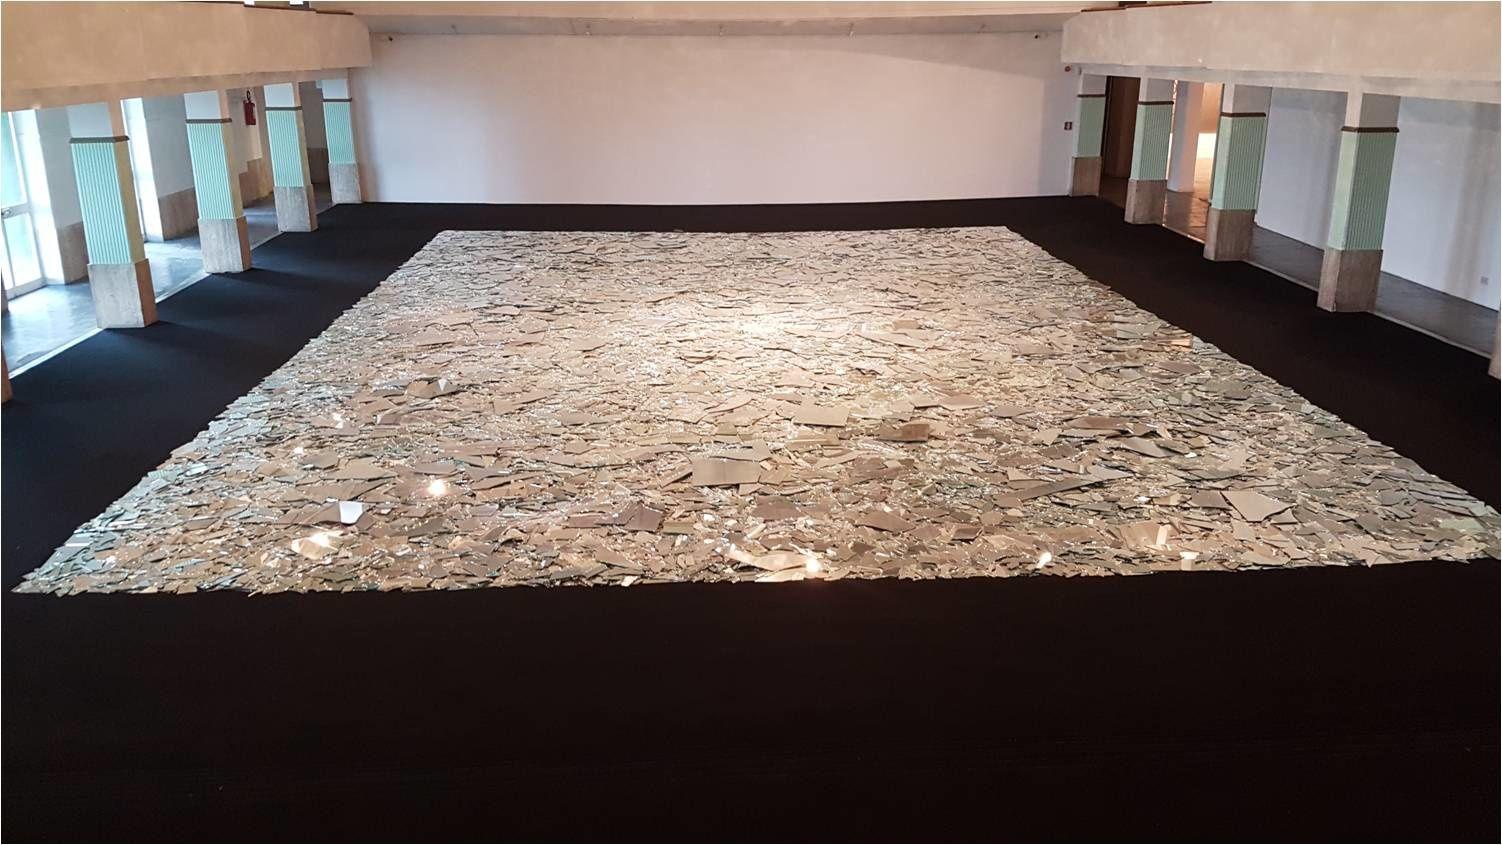 San Gimignano, Galerie d'art contemporain, 06/04/17 15:35